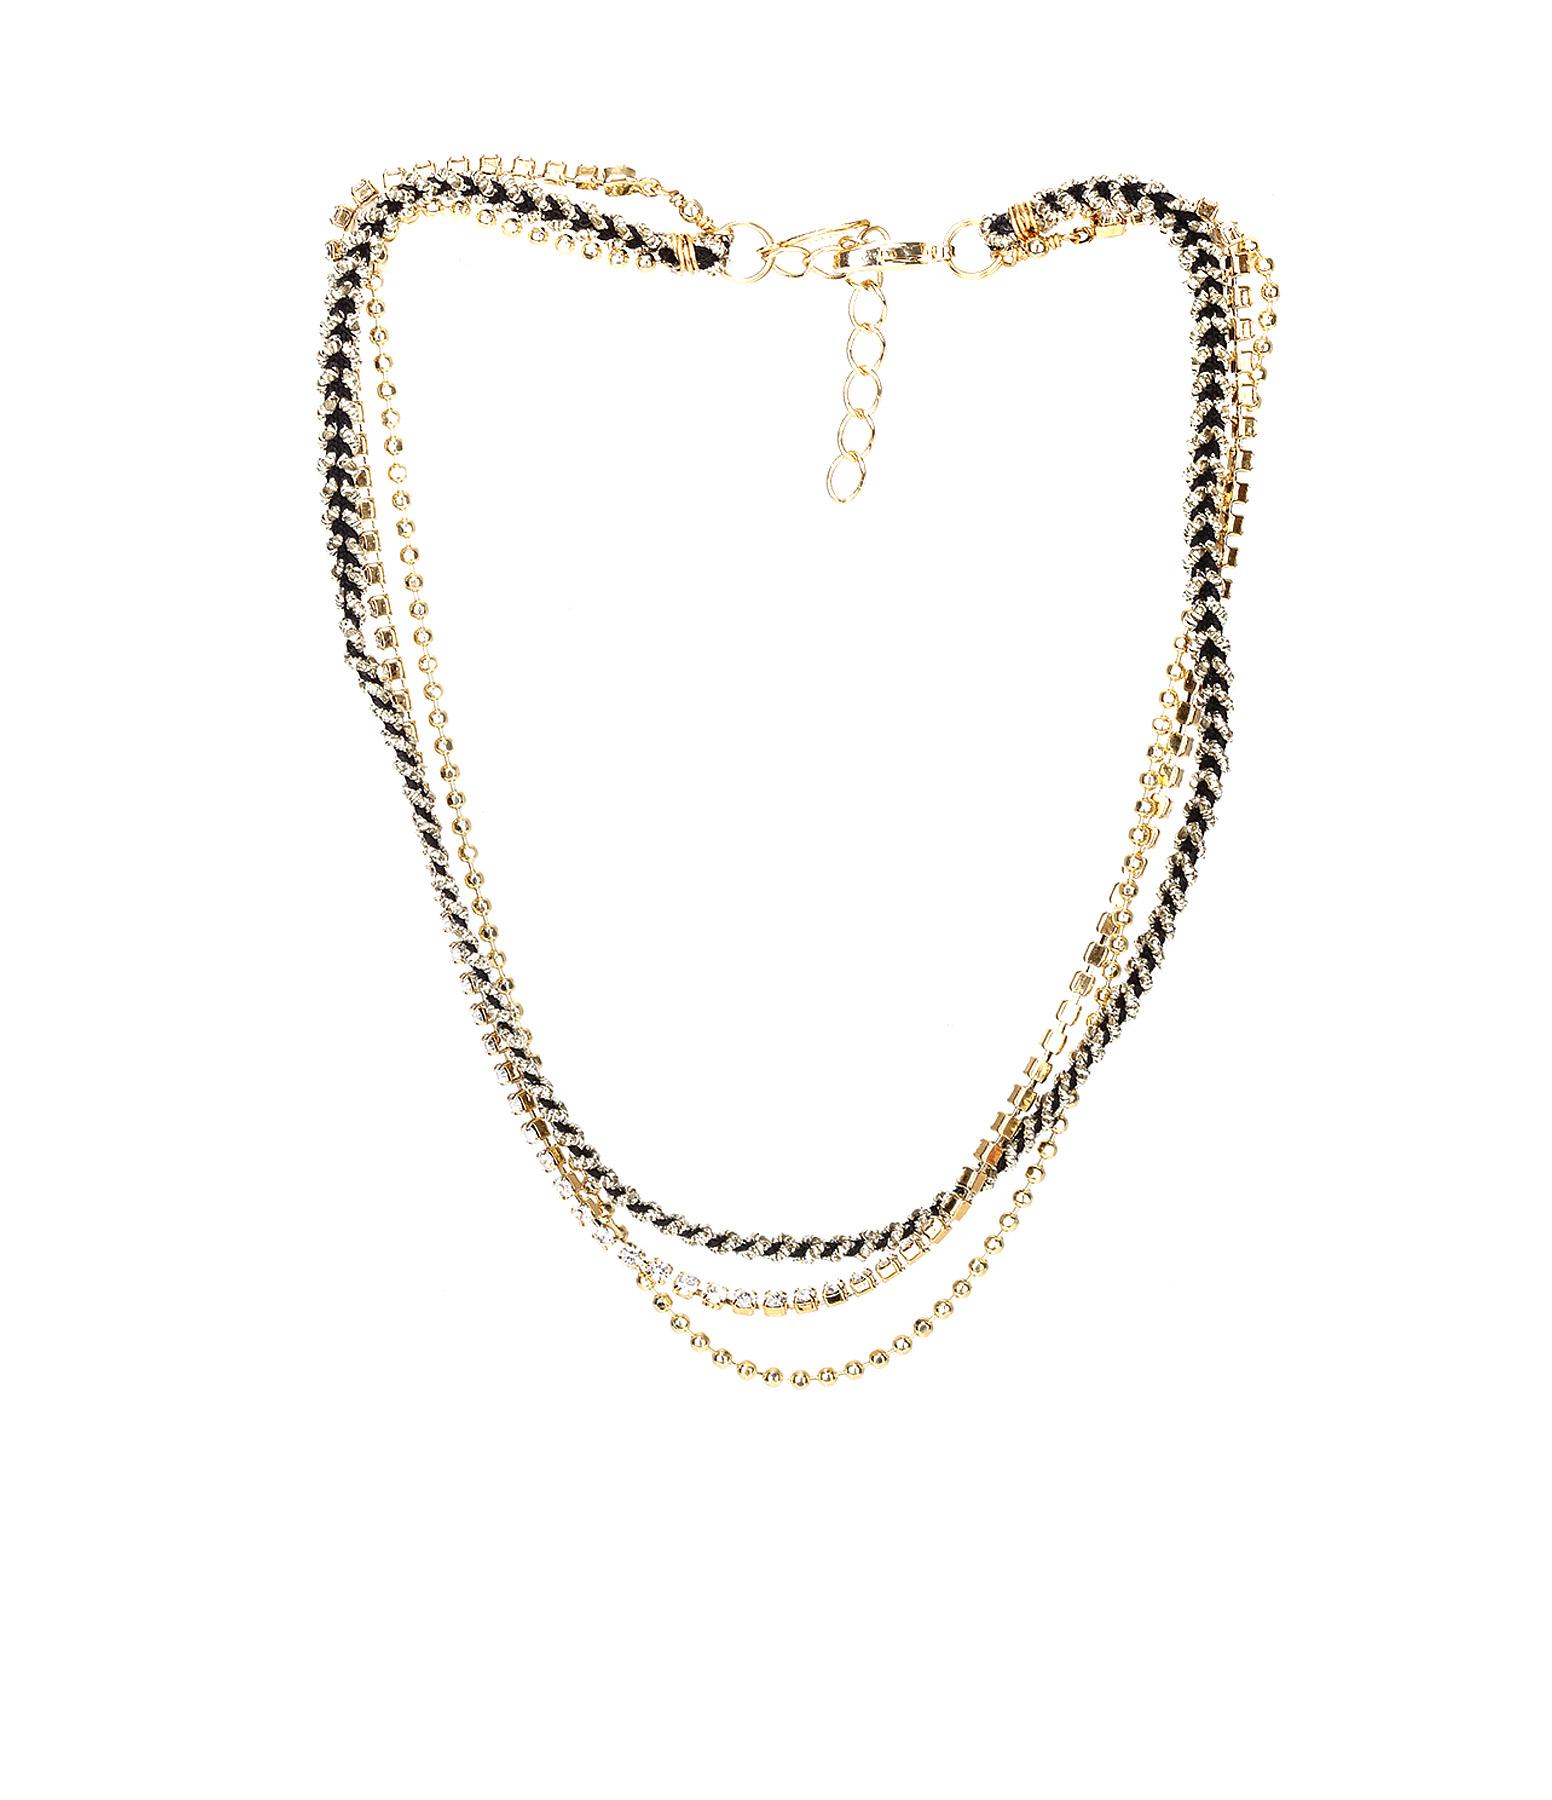 Collier / Bracelet 3 rangs Strass Noir